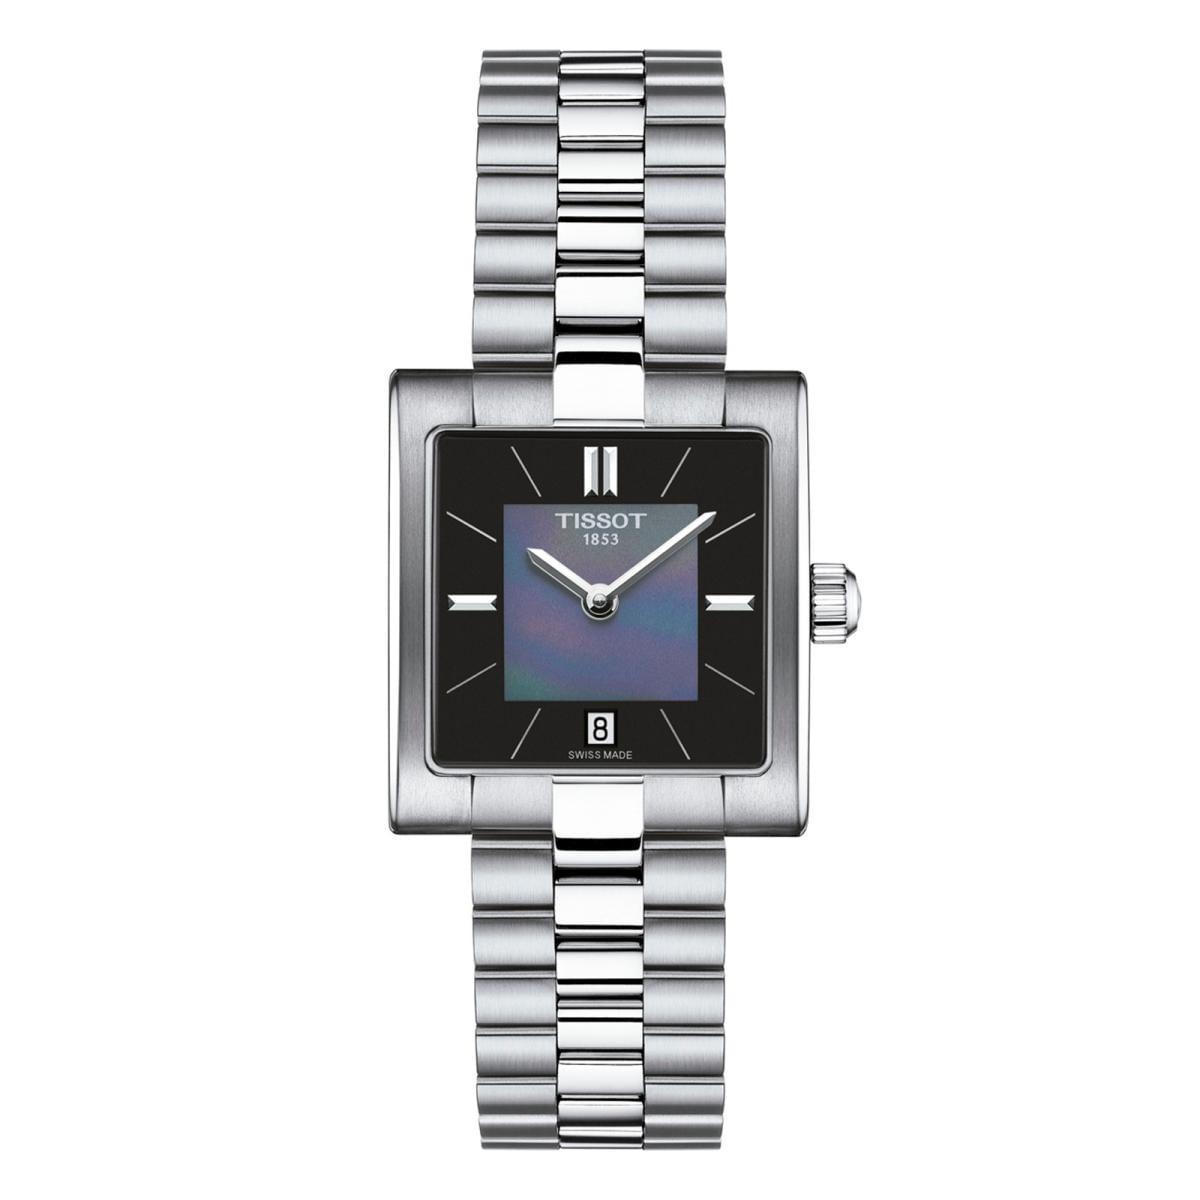 da18e1bd4da2 Reloj Tissot - T090.310.11.121.01 - MUJER - Time Square